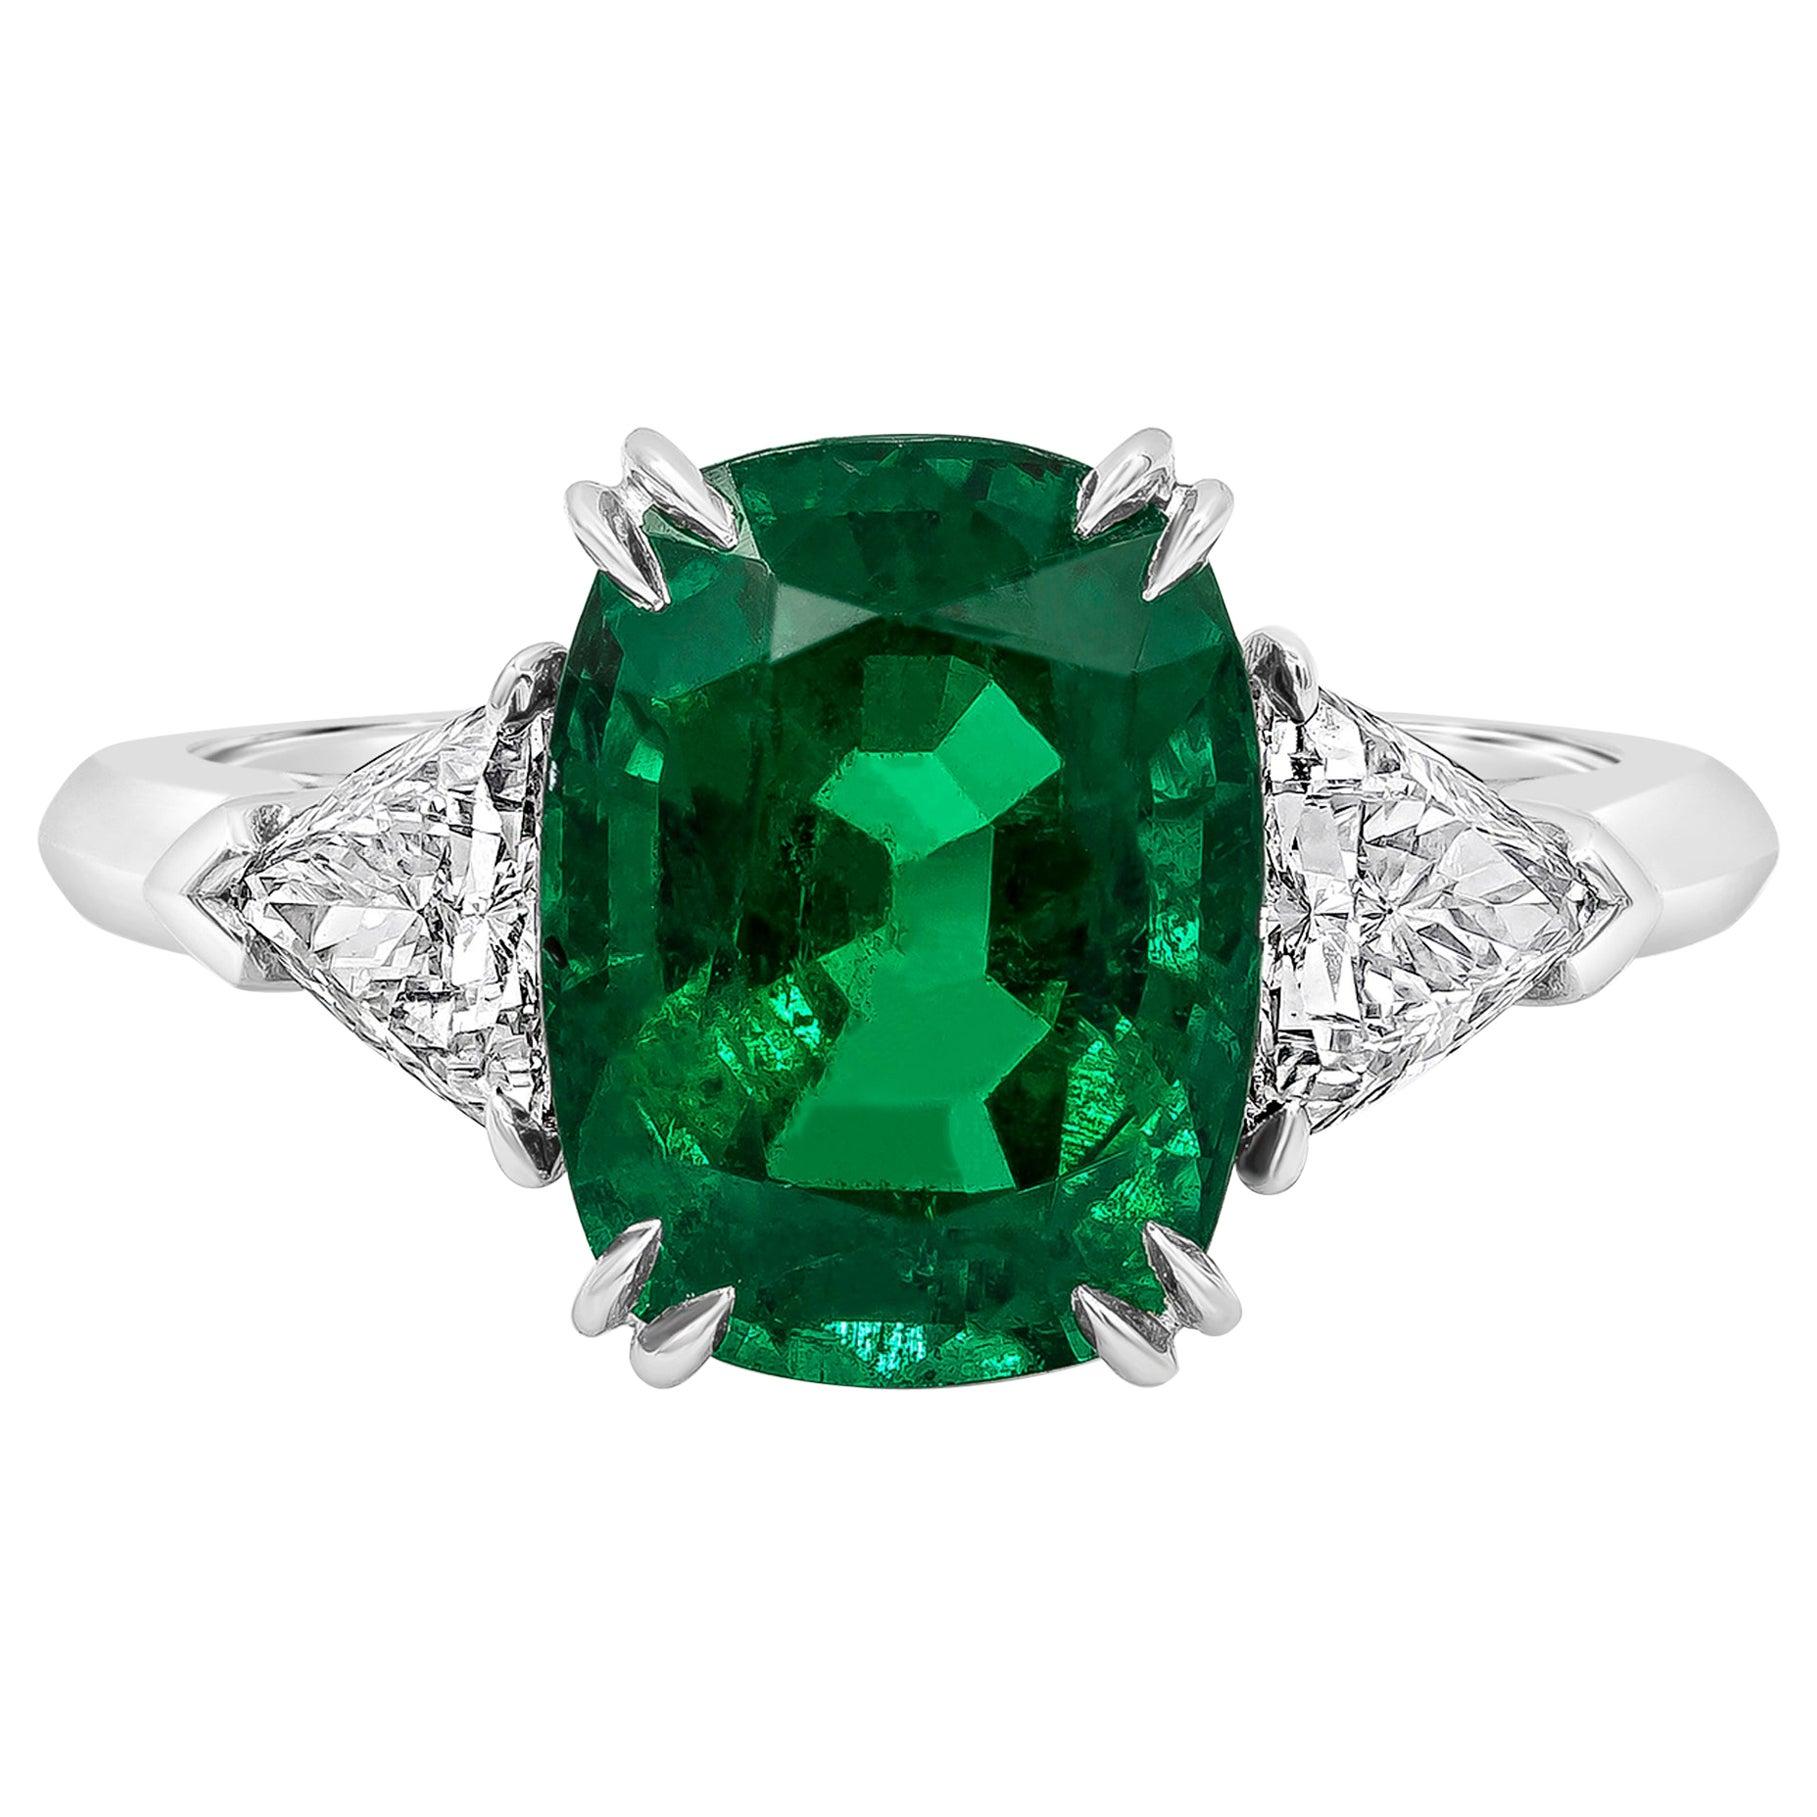 Roman Malakov, Cushion Cut Emerald and Diamond Three-Stone Engagement Ring